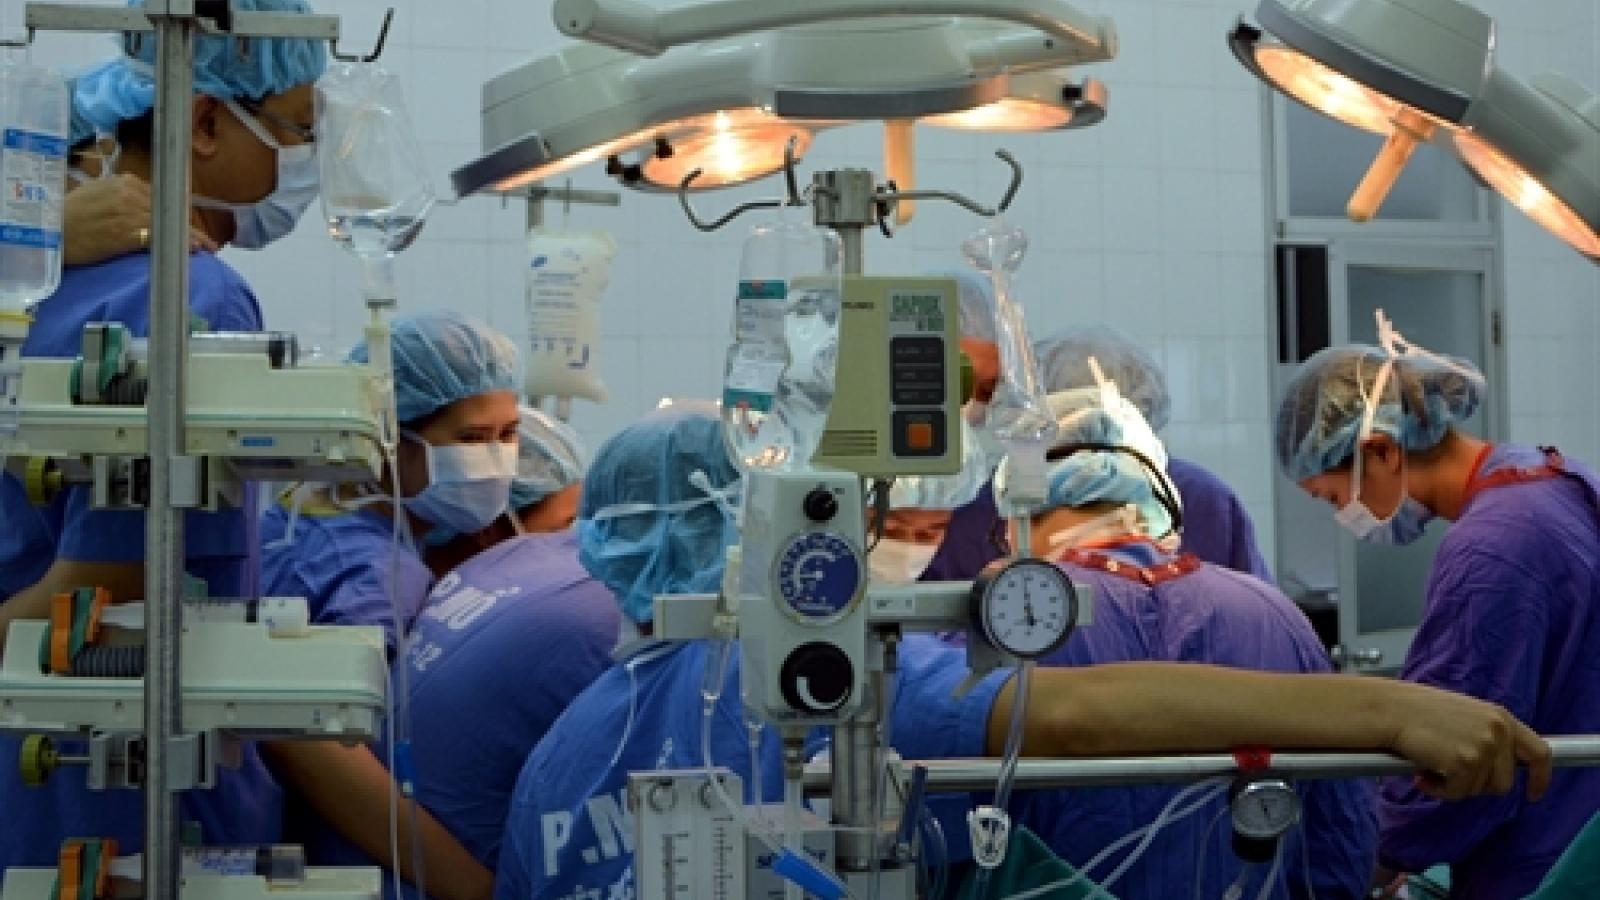 Organ donors sought as transplant demand rises